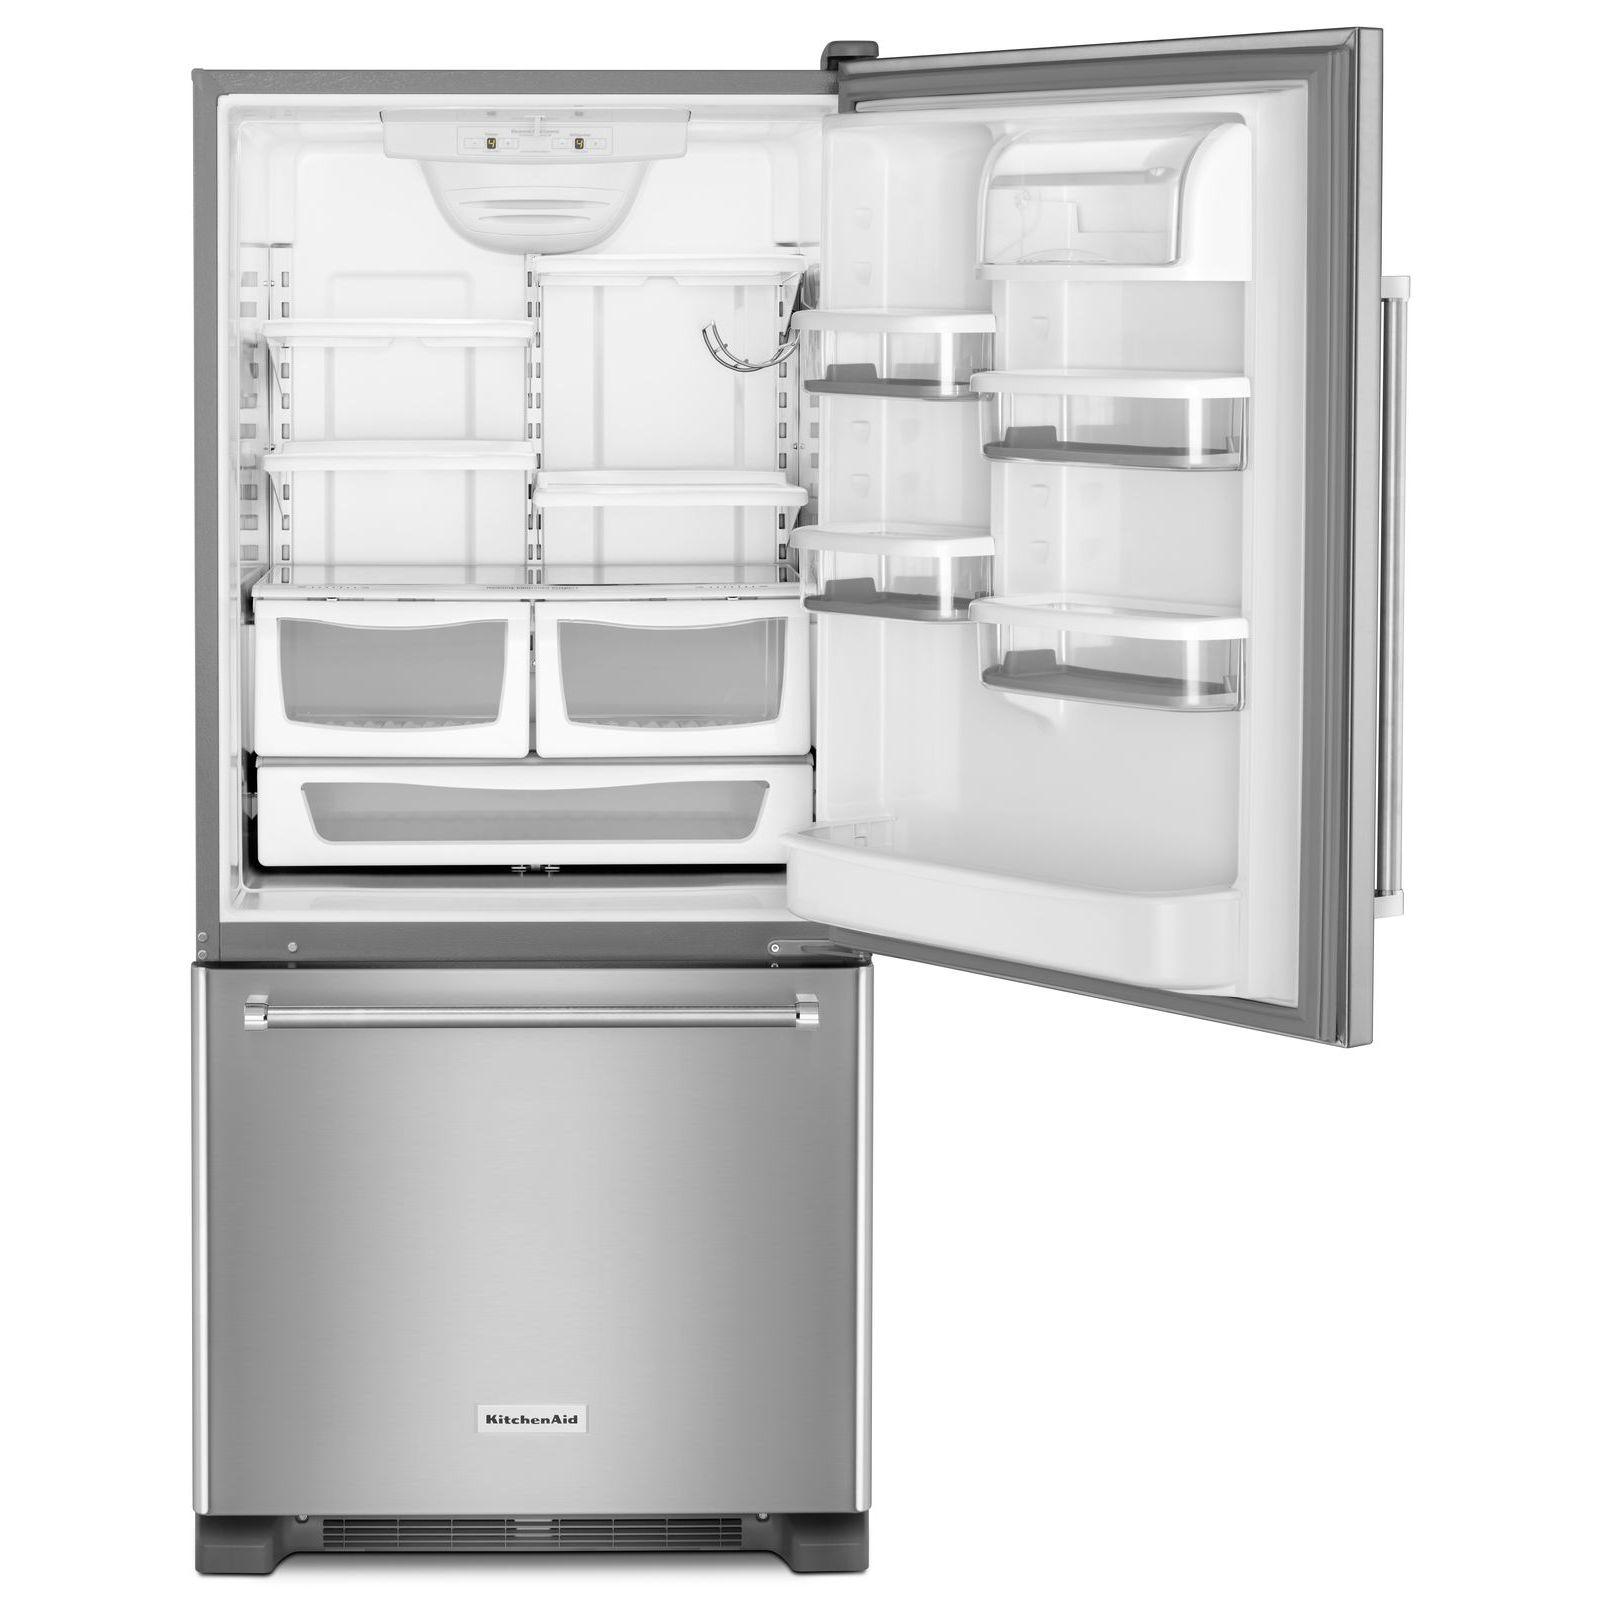 KitchenAid KRBR109ESS 19 cu. ft. Bottom Mount Refrigerator - Stainless Steel